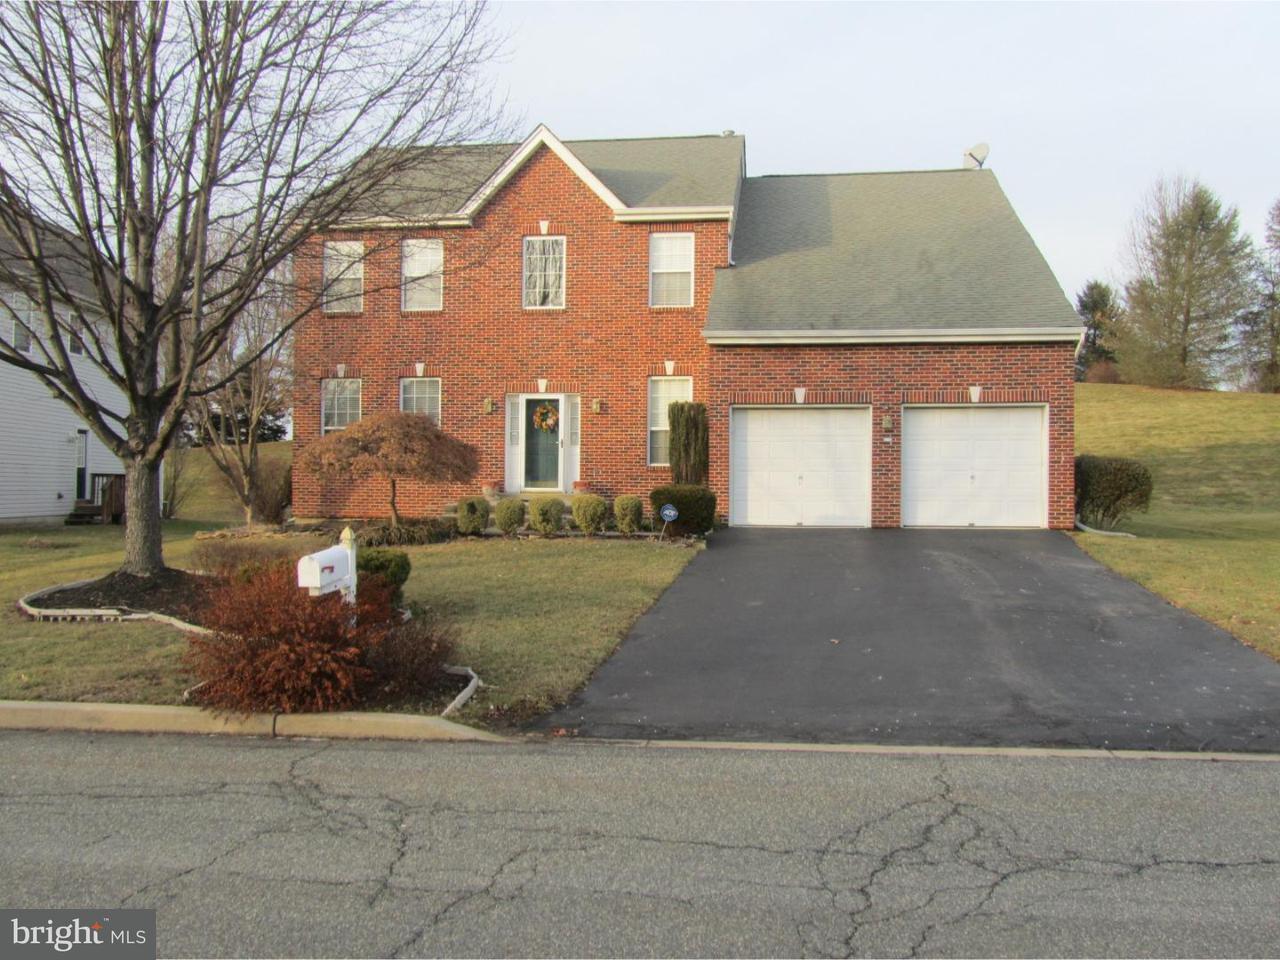 Casa Unifamiliar por un Alquiler en 129 SPUR Lane West Chester, Pennsylvania 19382 Estados Unidos